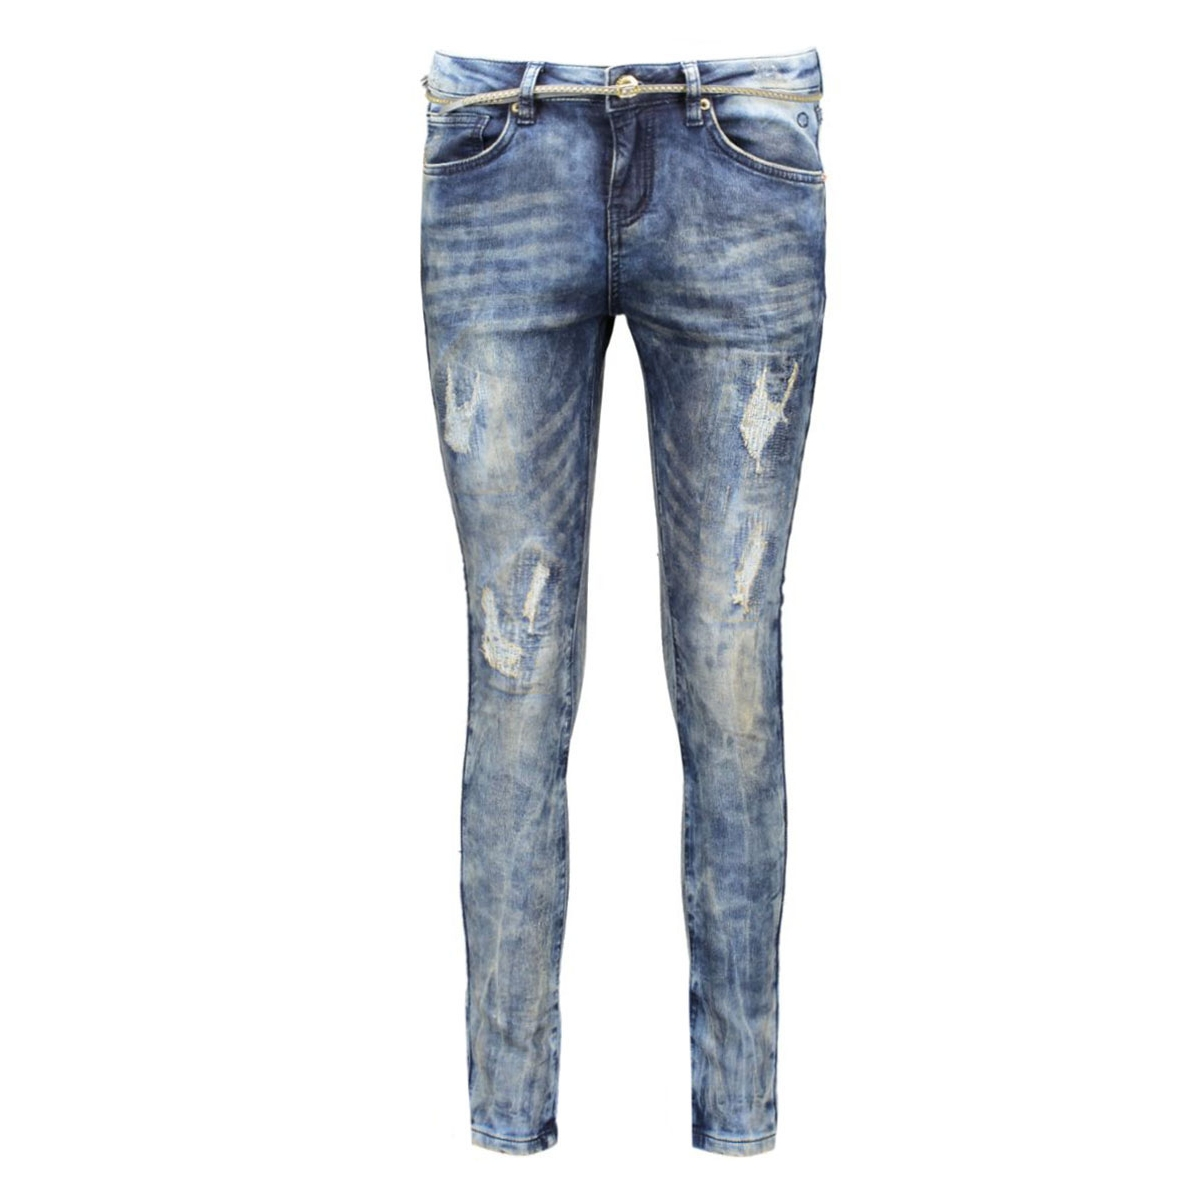 w16.10.3389 cooper jogg circle of trust jeans blue rigid